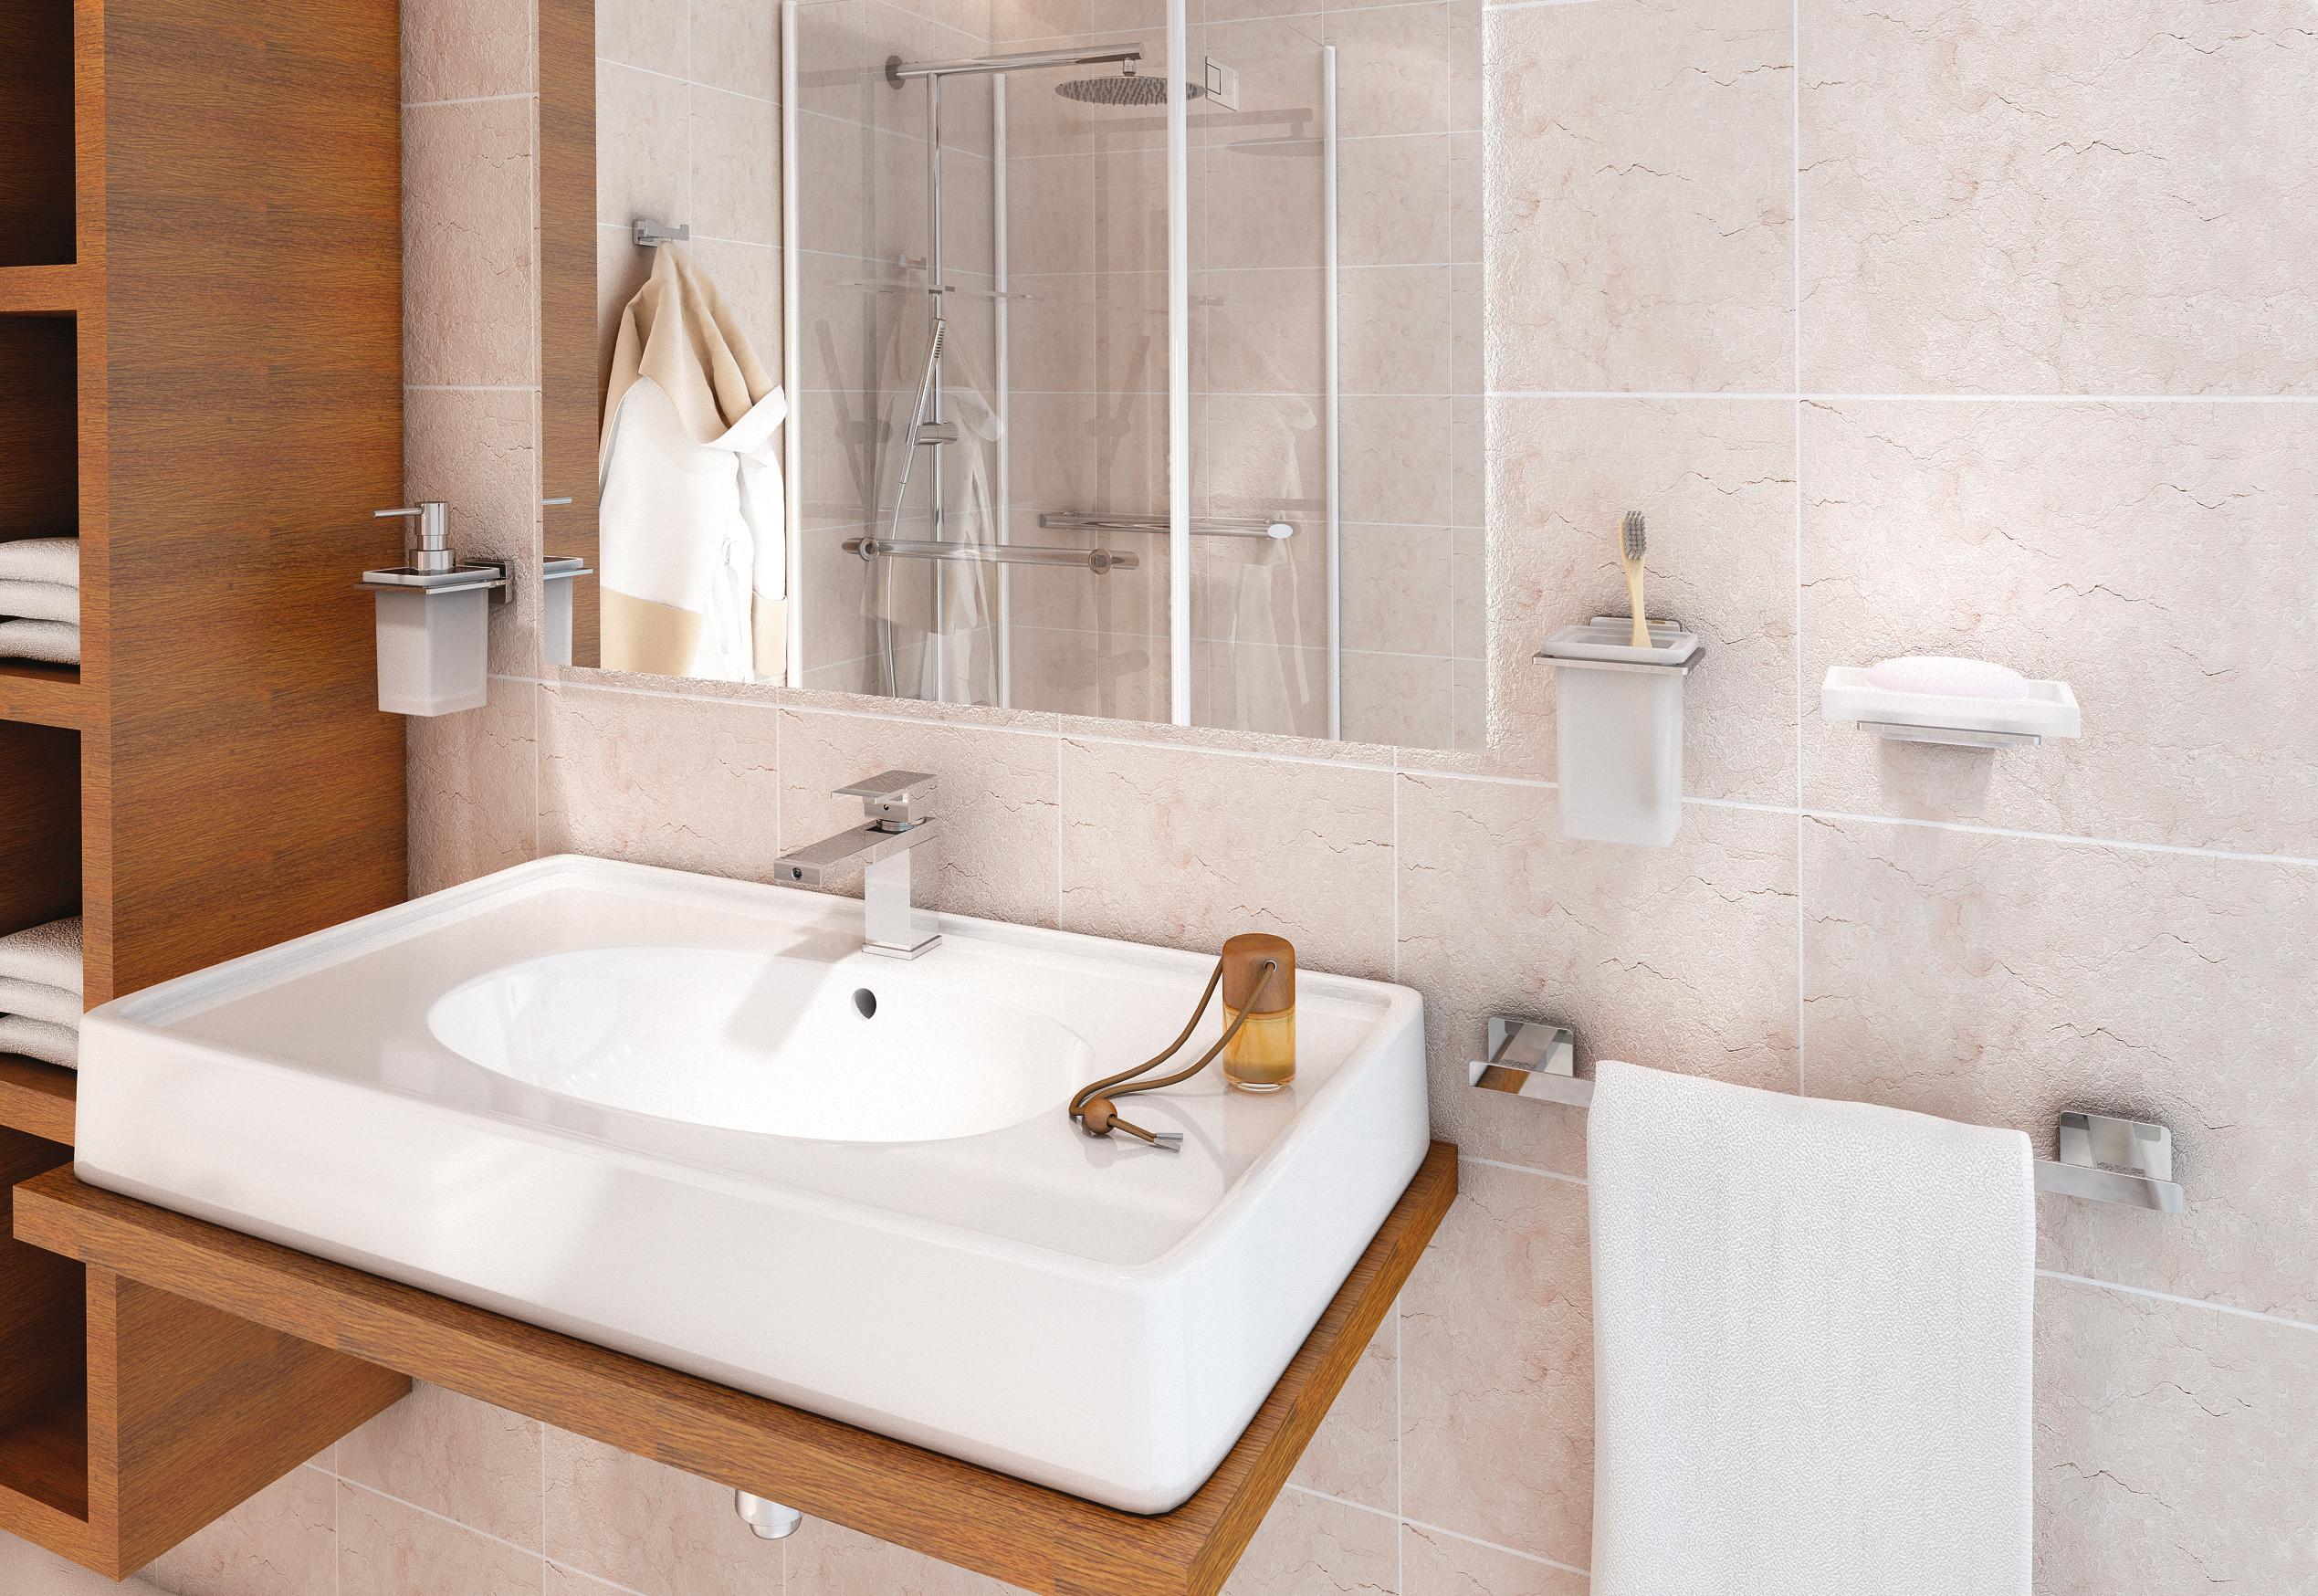 Choosing your new Bathroom Mirrored Cabinets, Bathrooms Mirrors & Bathroom Accessories